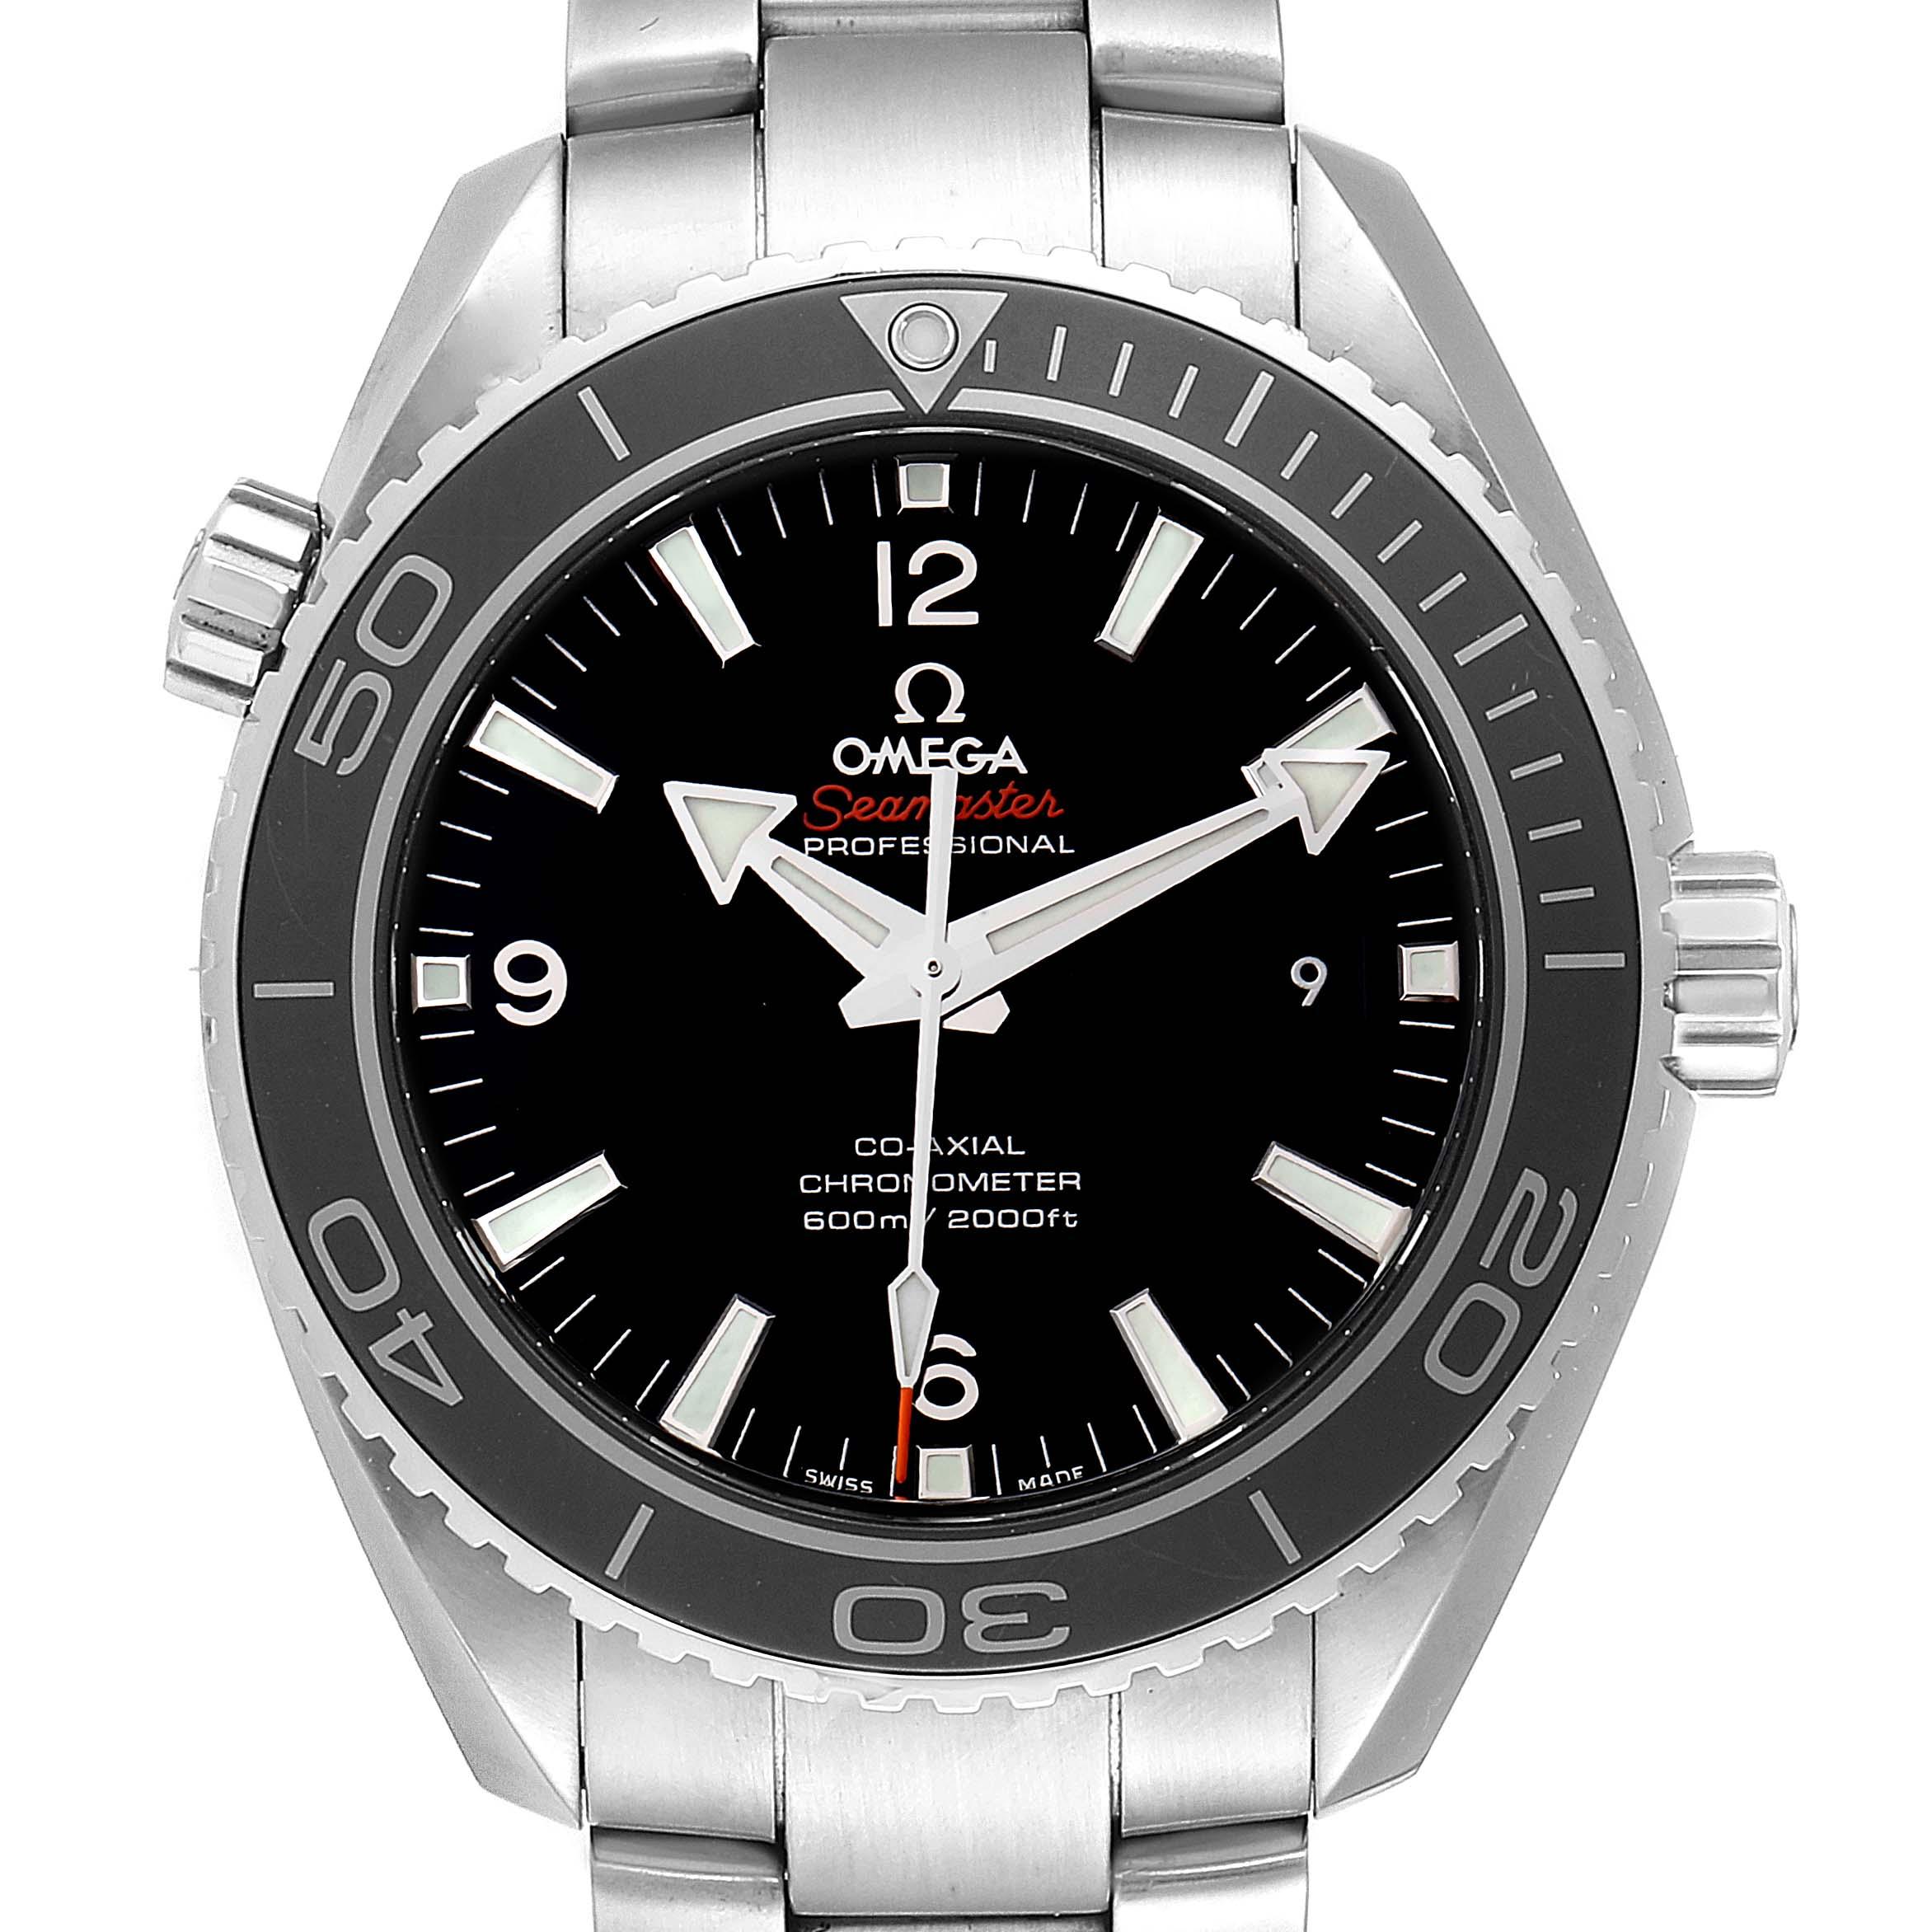 Omega Seamaster Planet Ocean 600M Mens Watch 232.30.46.21.01.001 Card